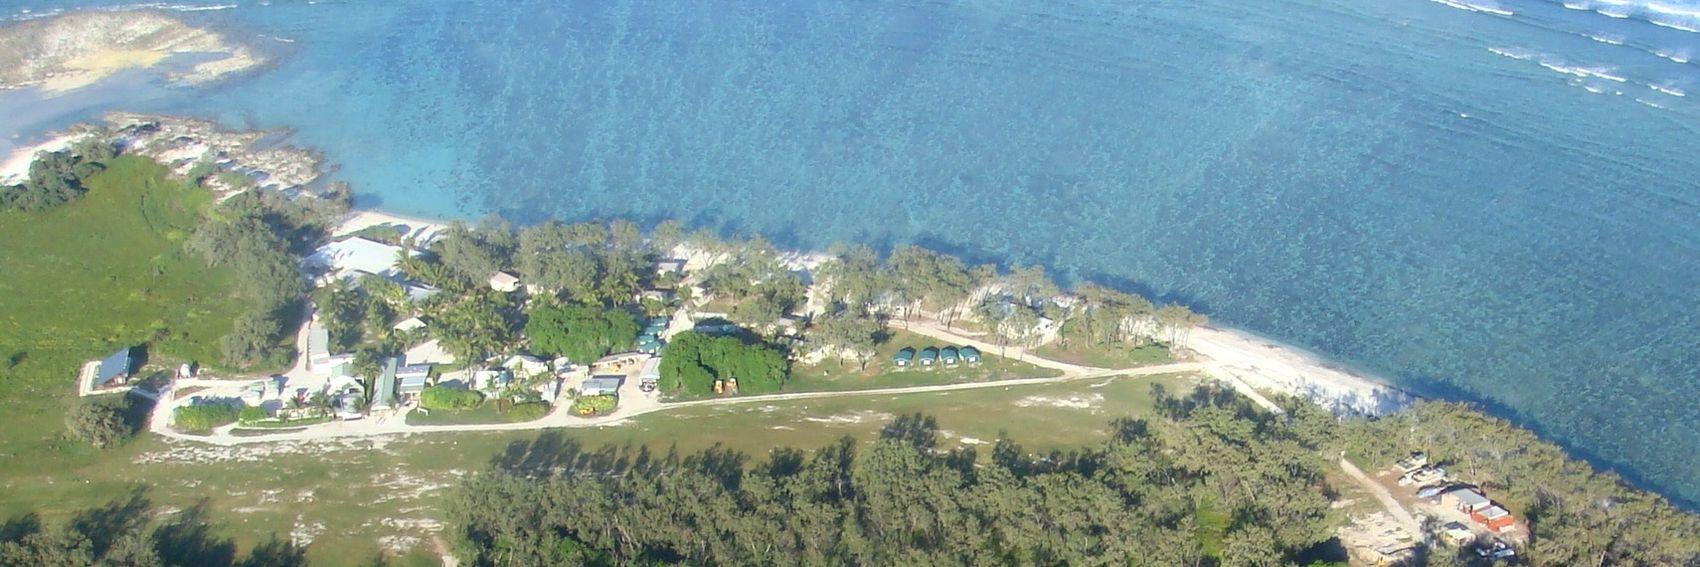 Lady Elliot Island Weather Bom